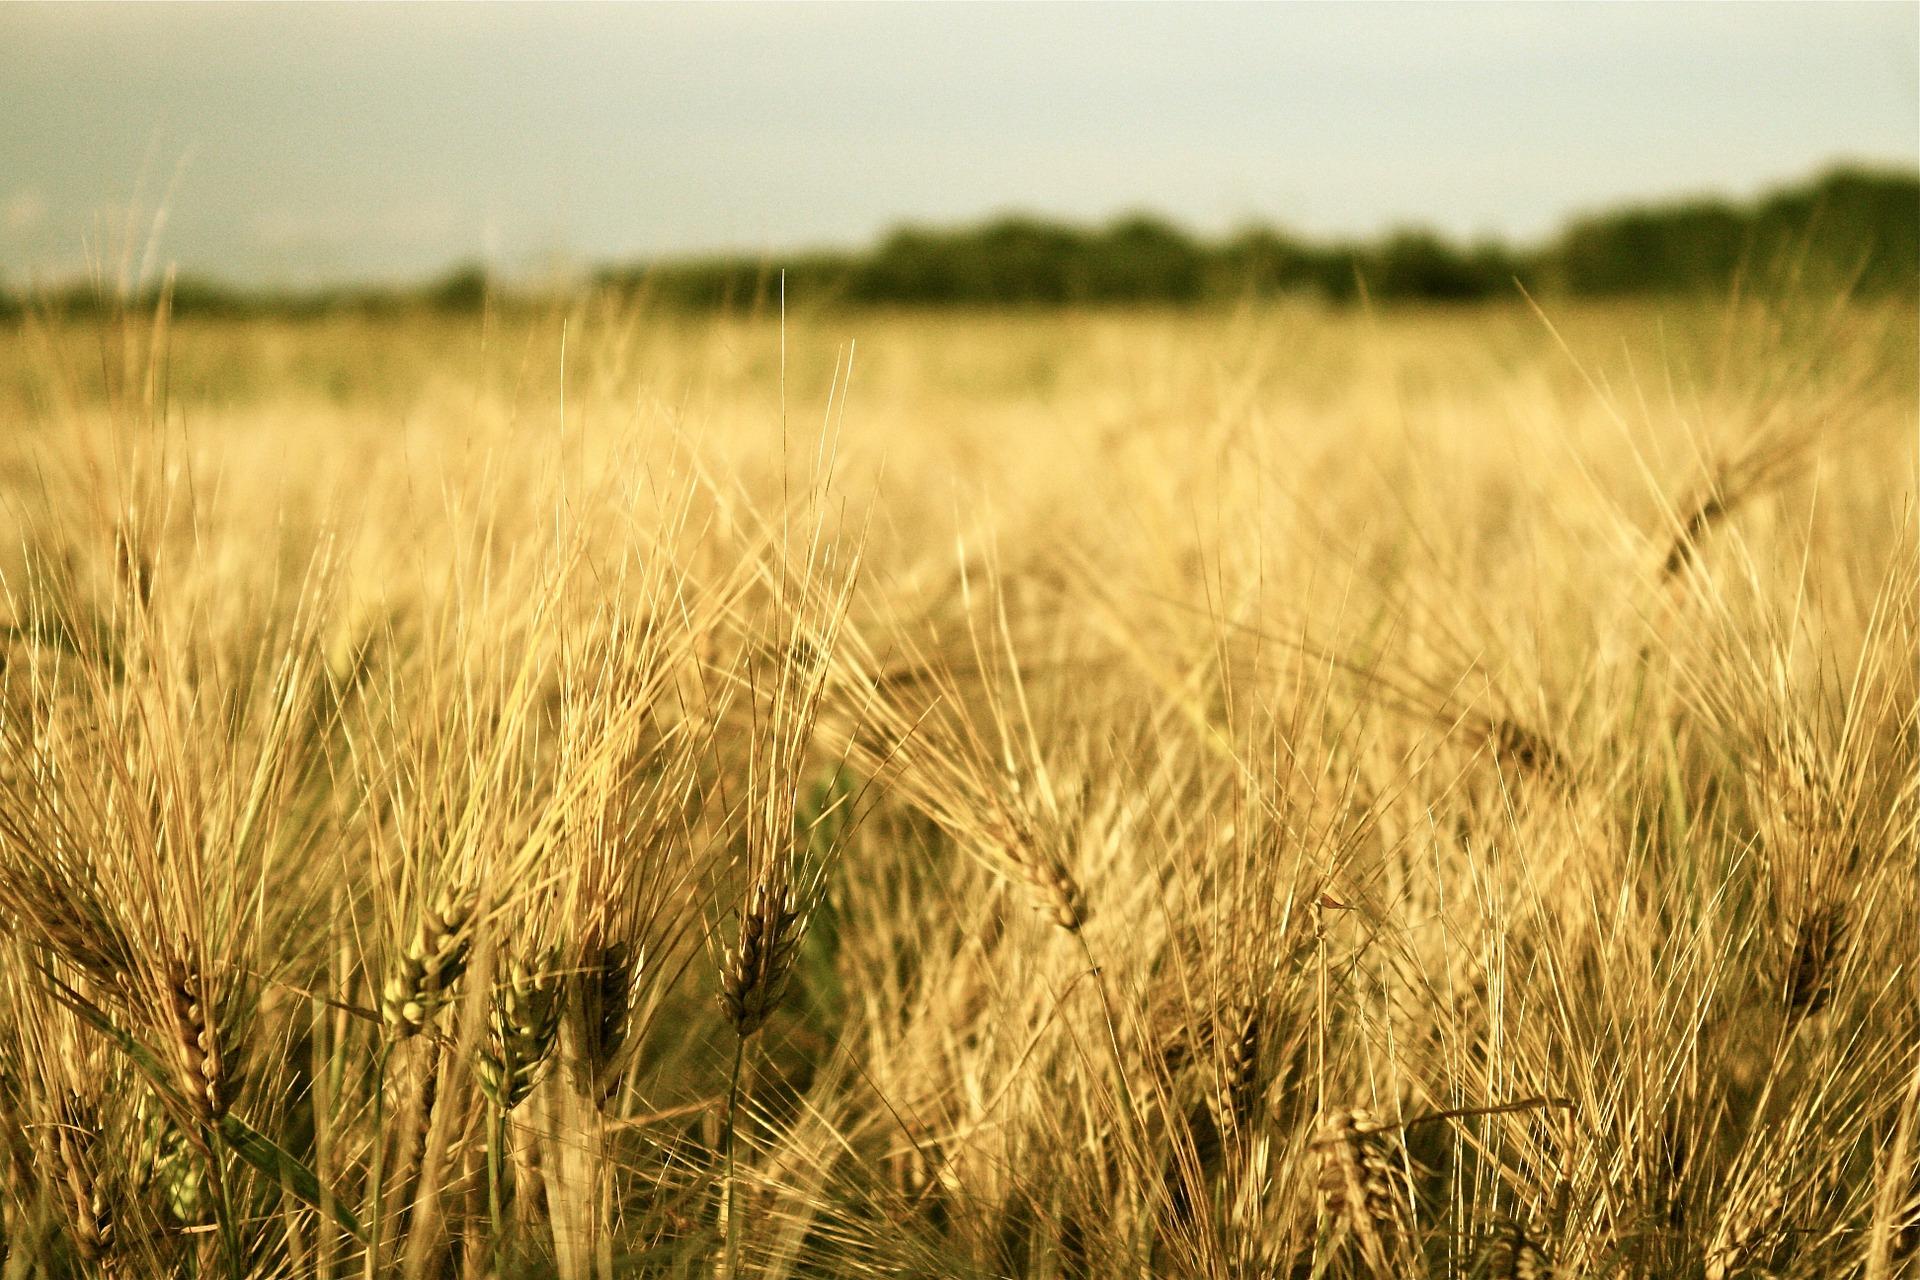 Barley field stock image